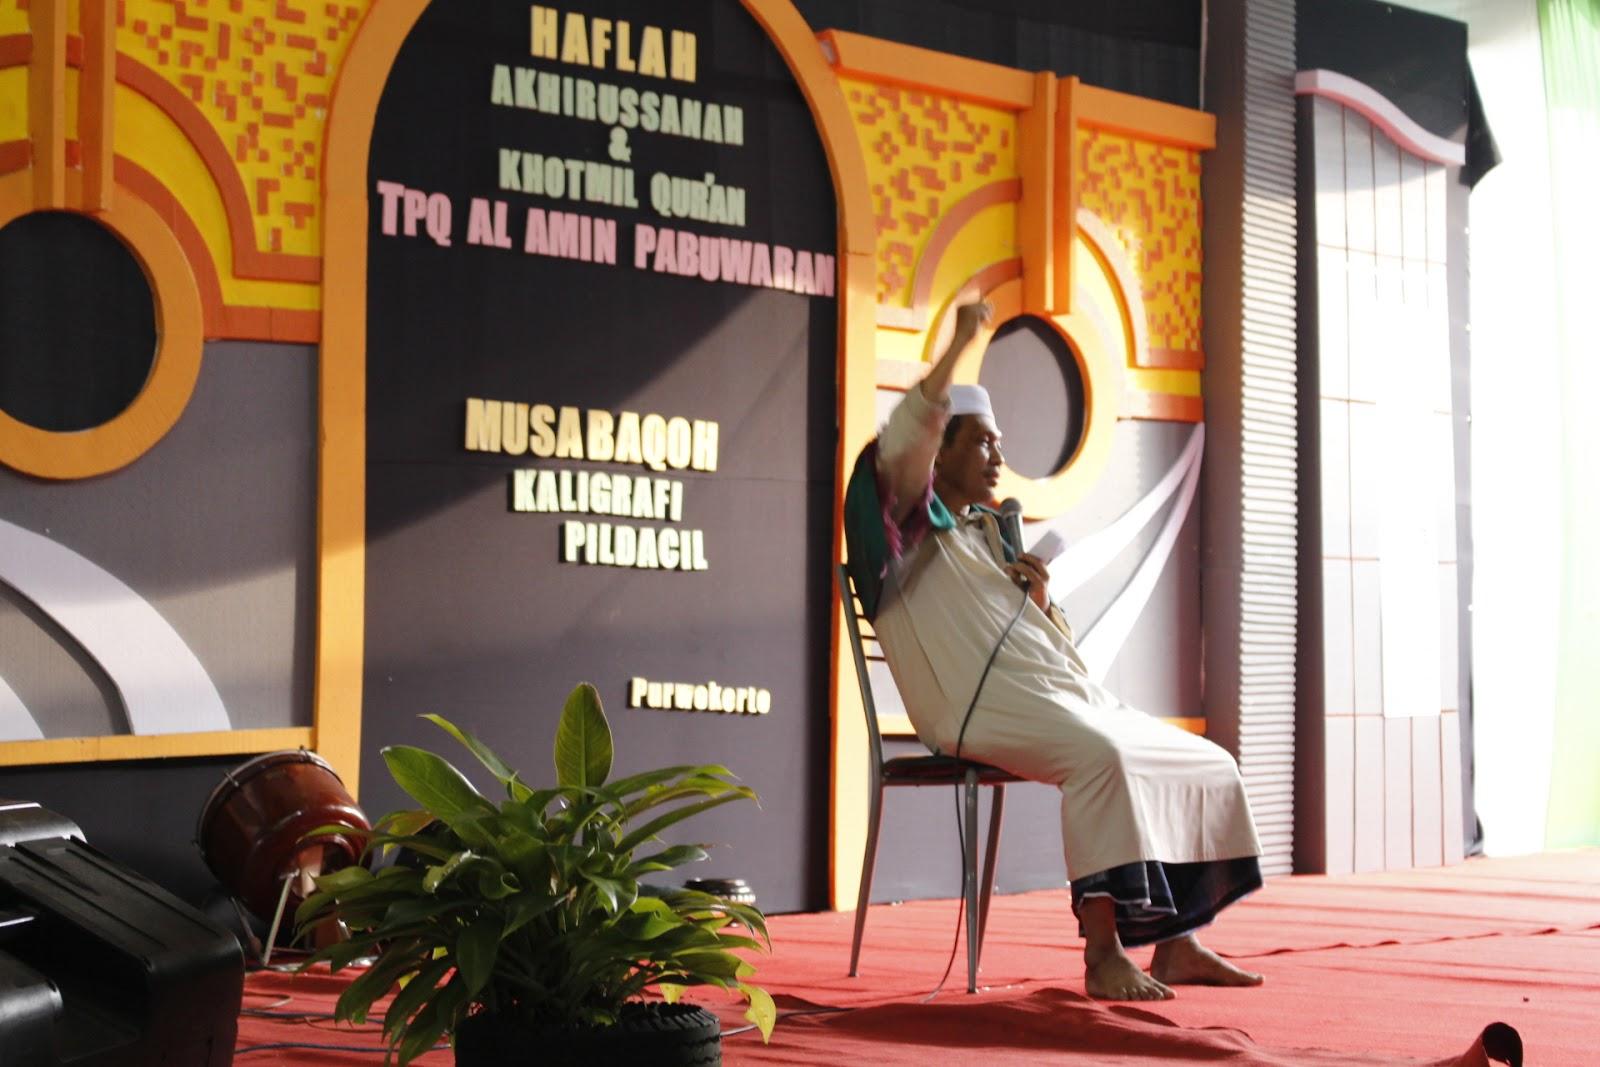 Khotmil Quran TPQ Al Amin Pabuwaran